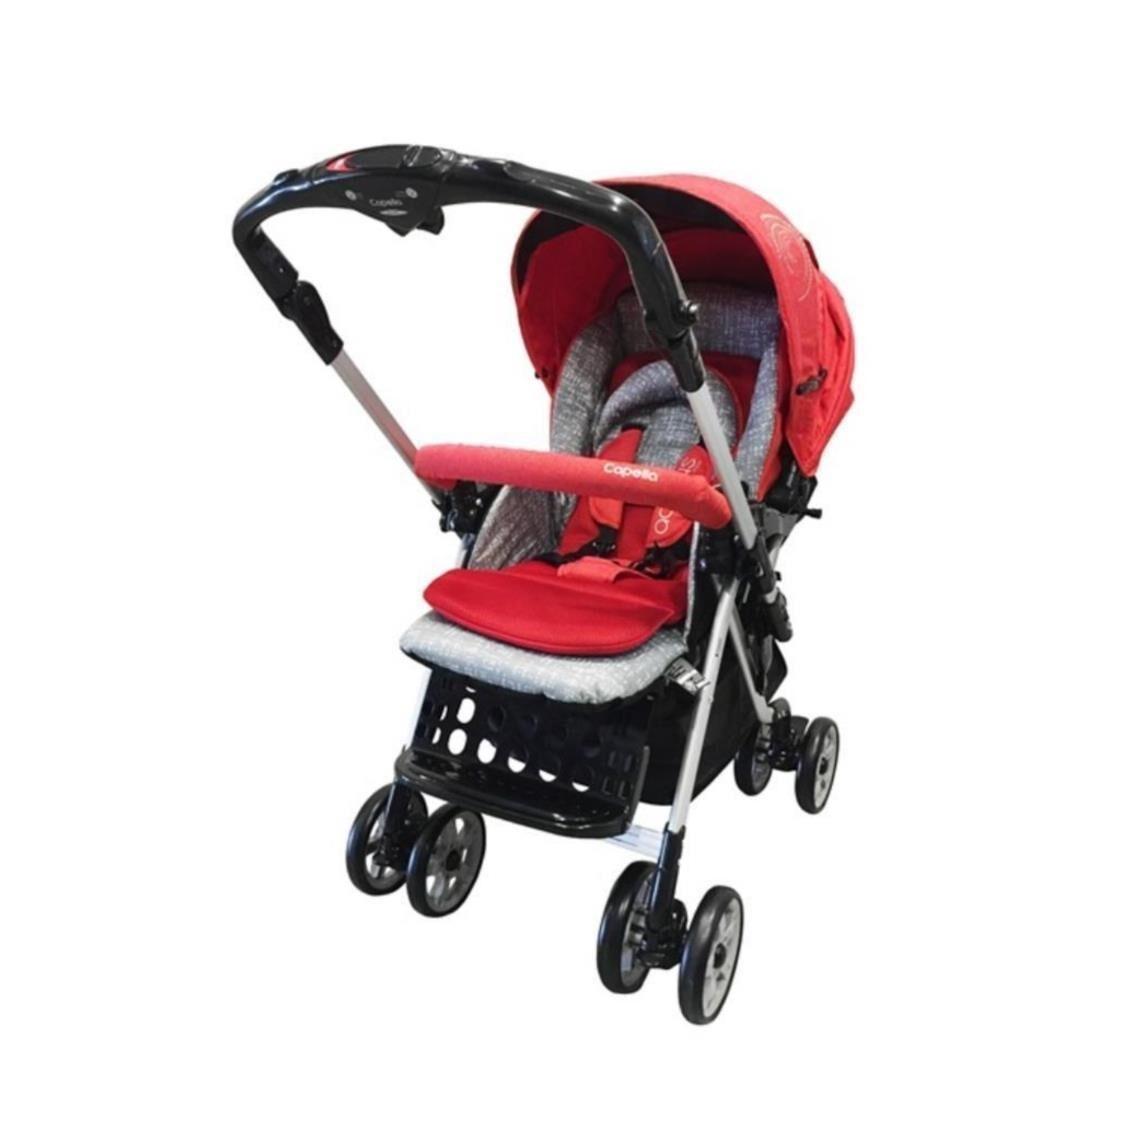 Adonis Travel System Stroller Red Weight 860 kg